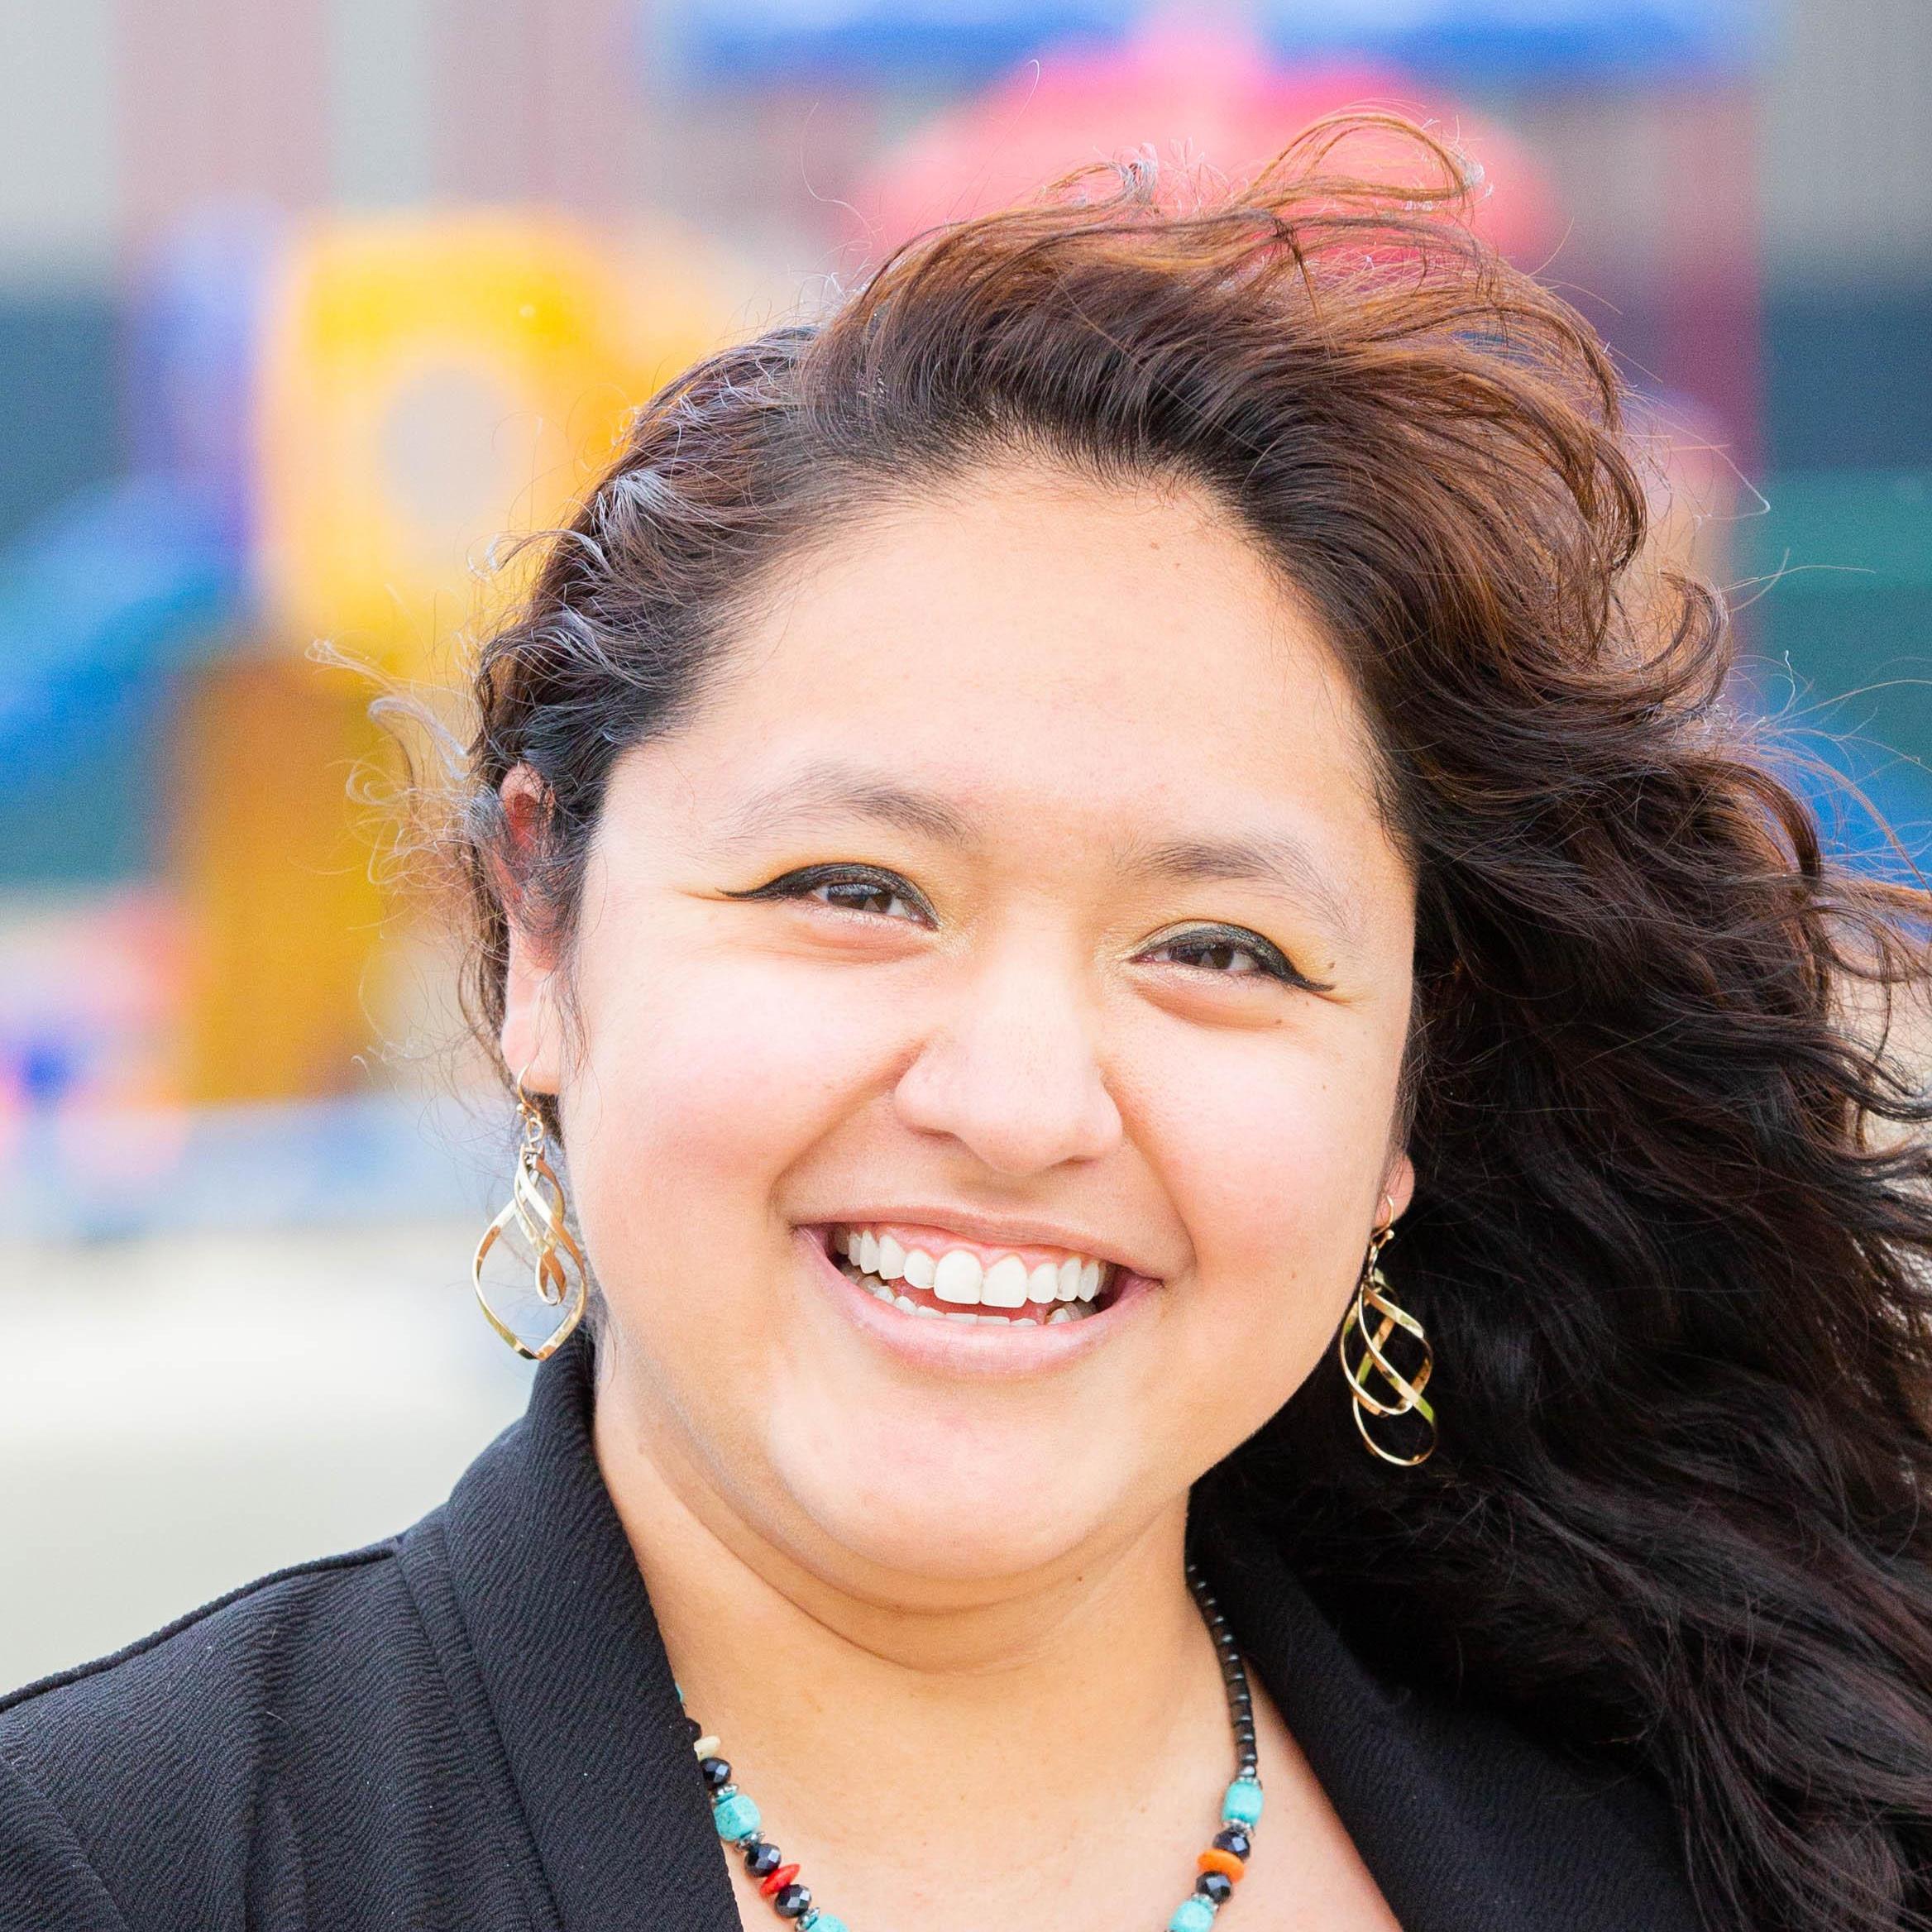 Julie Jaimes Godinez's Profile Photo